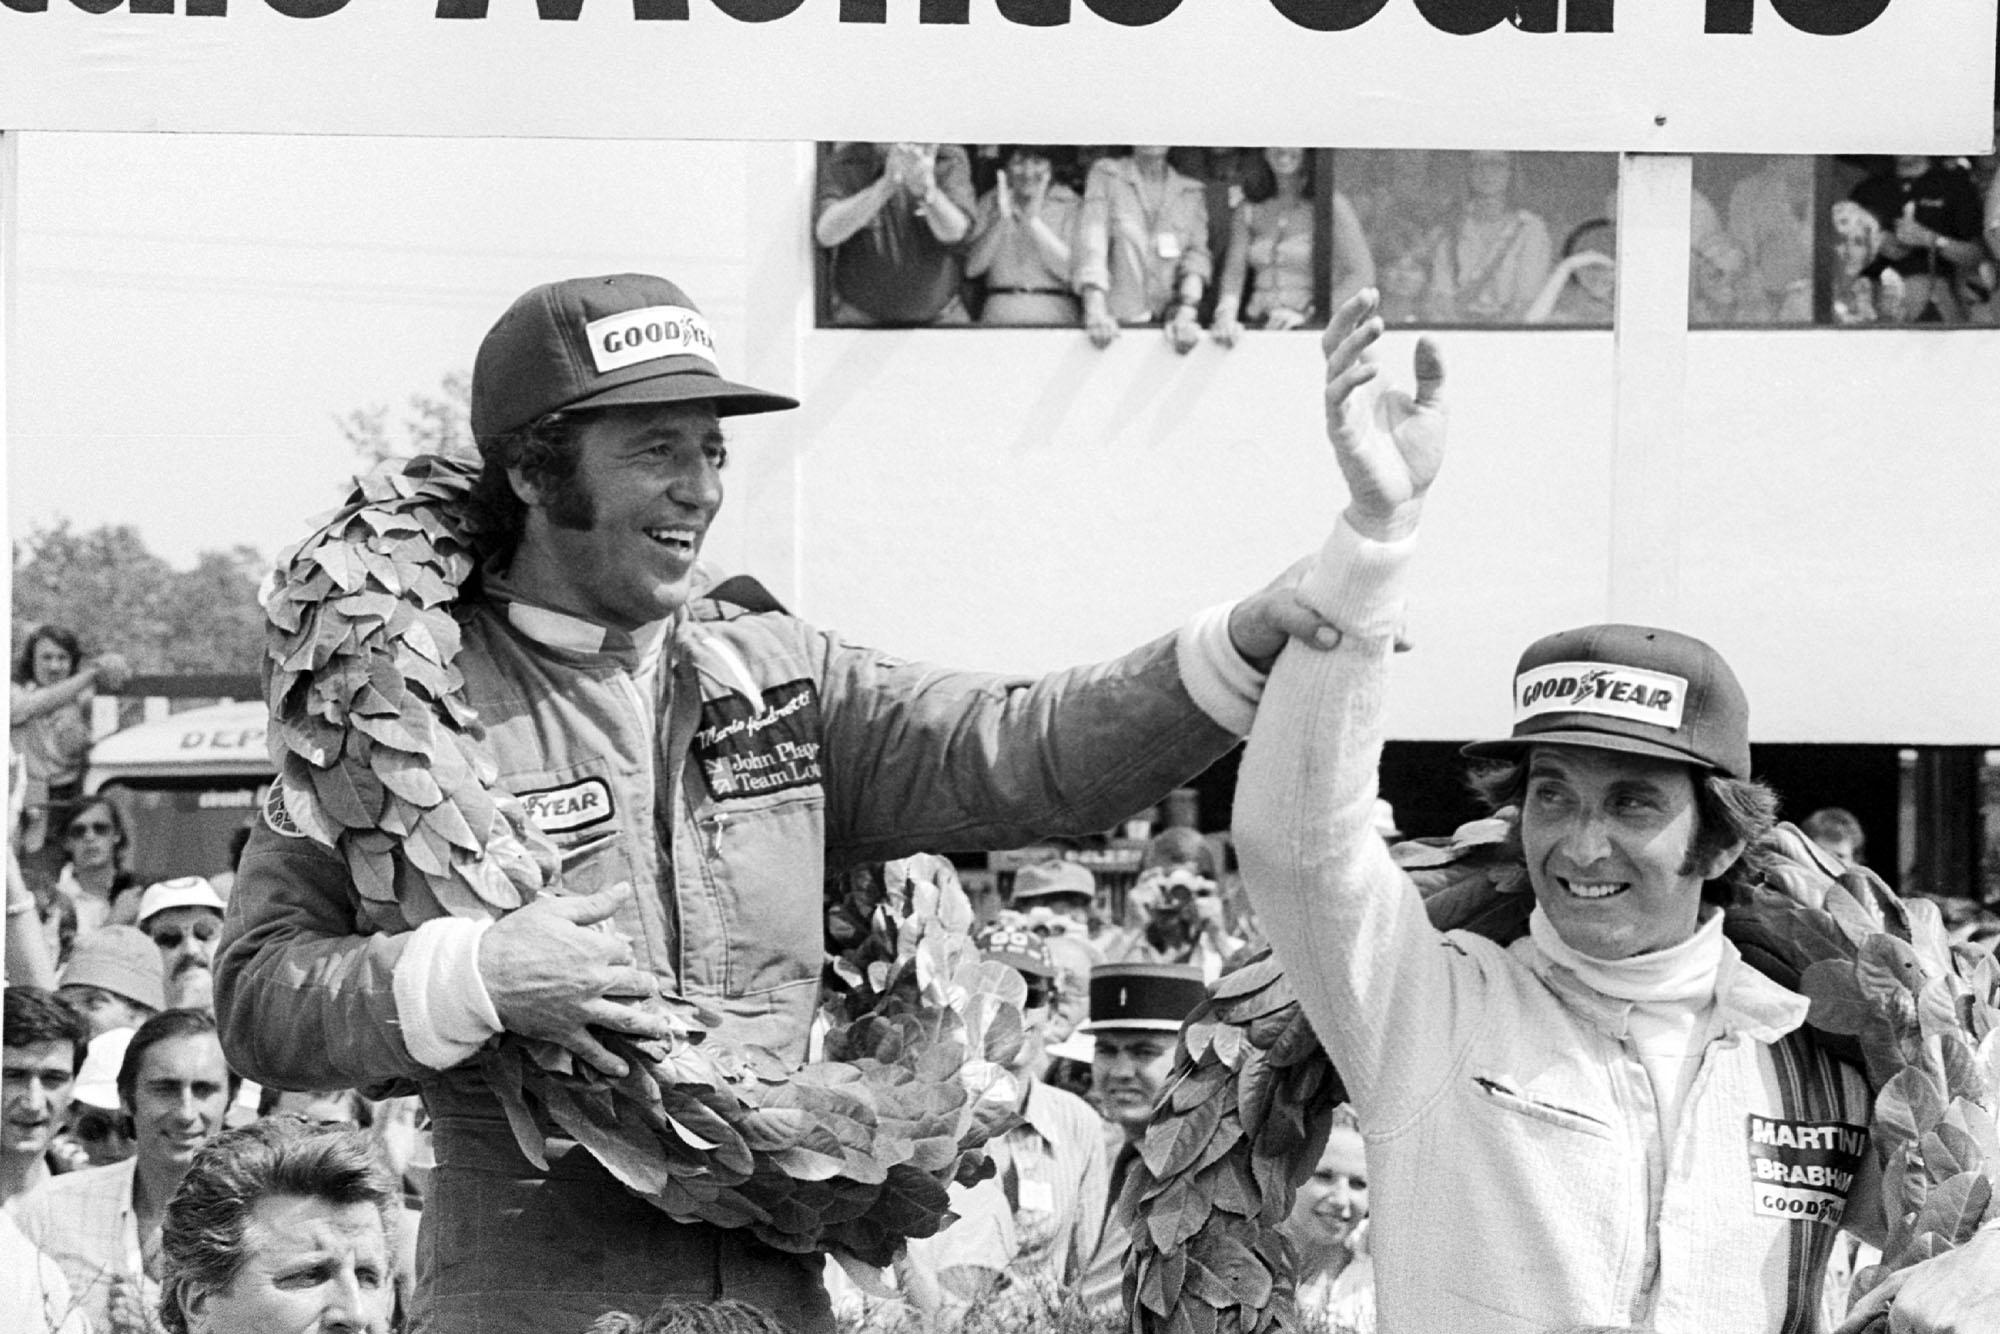 Mario Andretti (Lotus) celebrates on the podium after winning the 1977 French Grand Prix, Dijon.